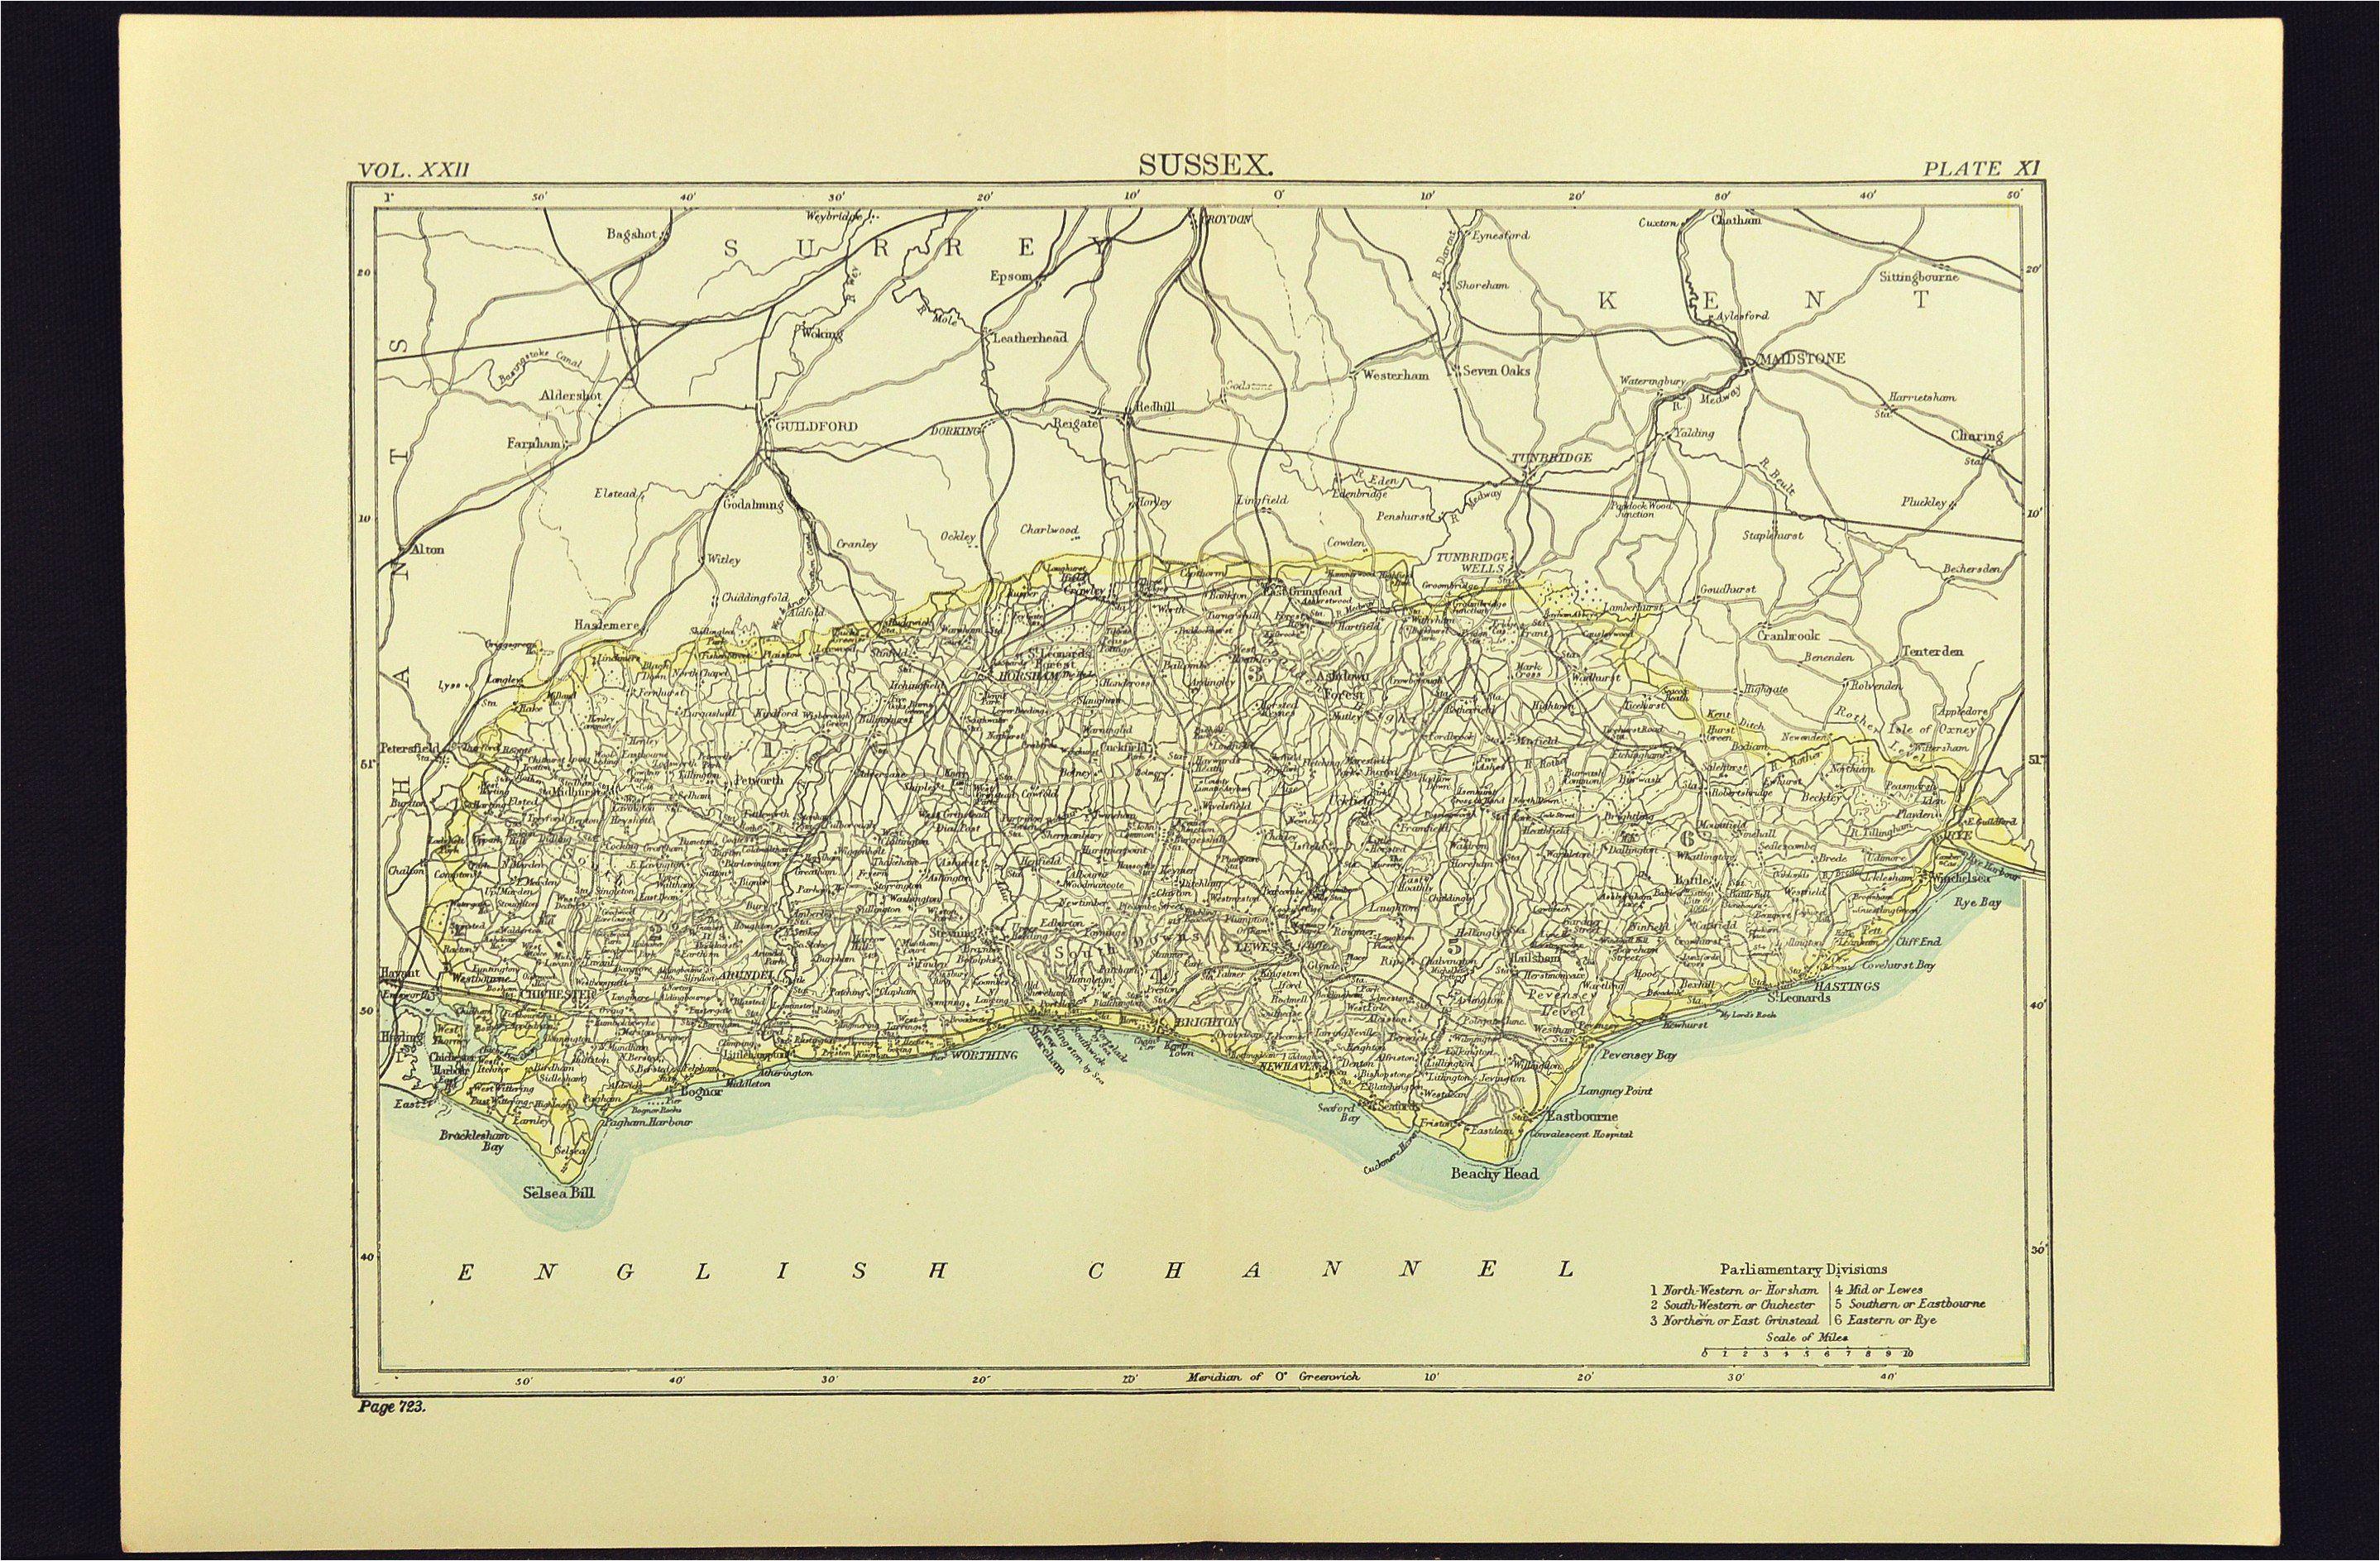 antique sussex map of sussex county england united kingdom brighton